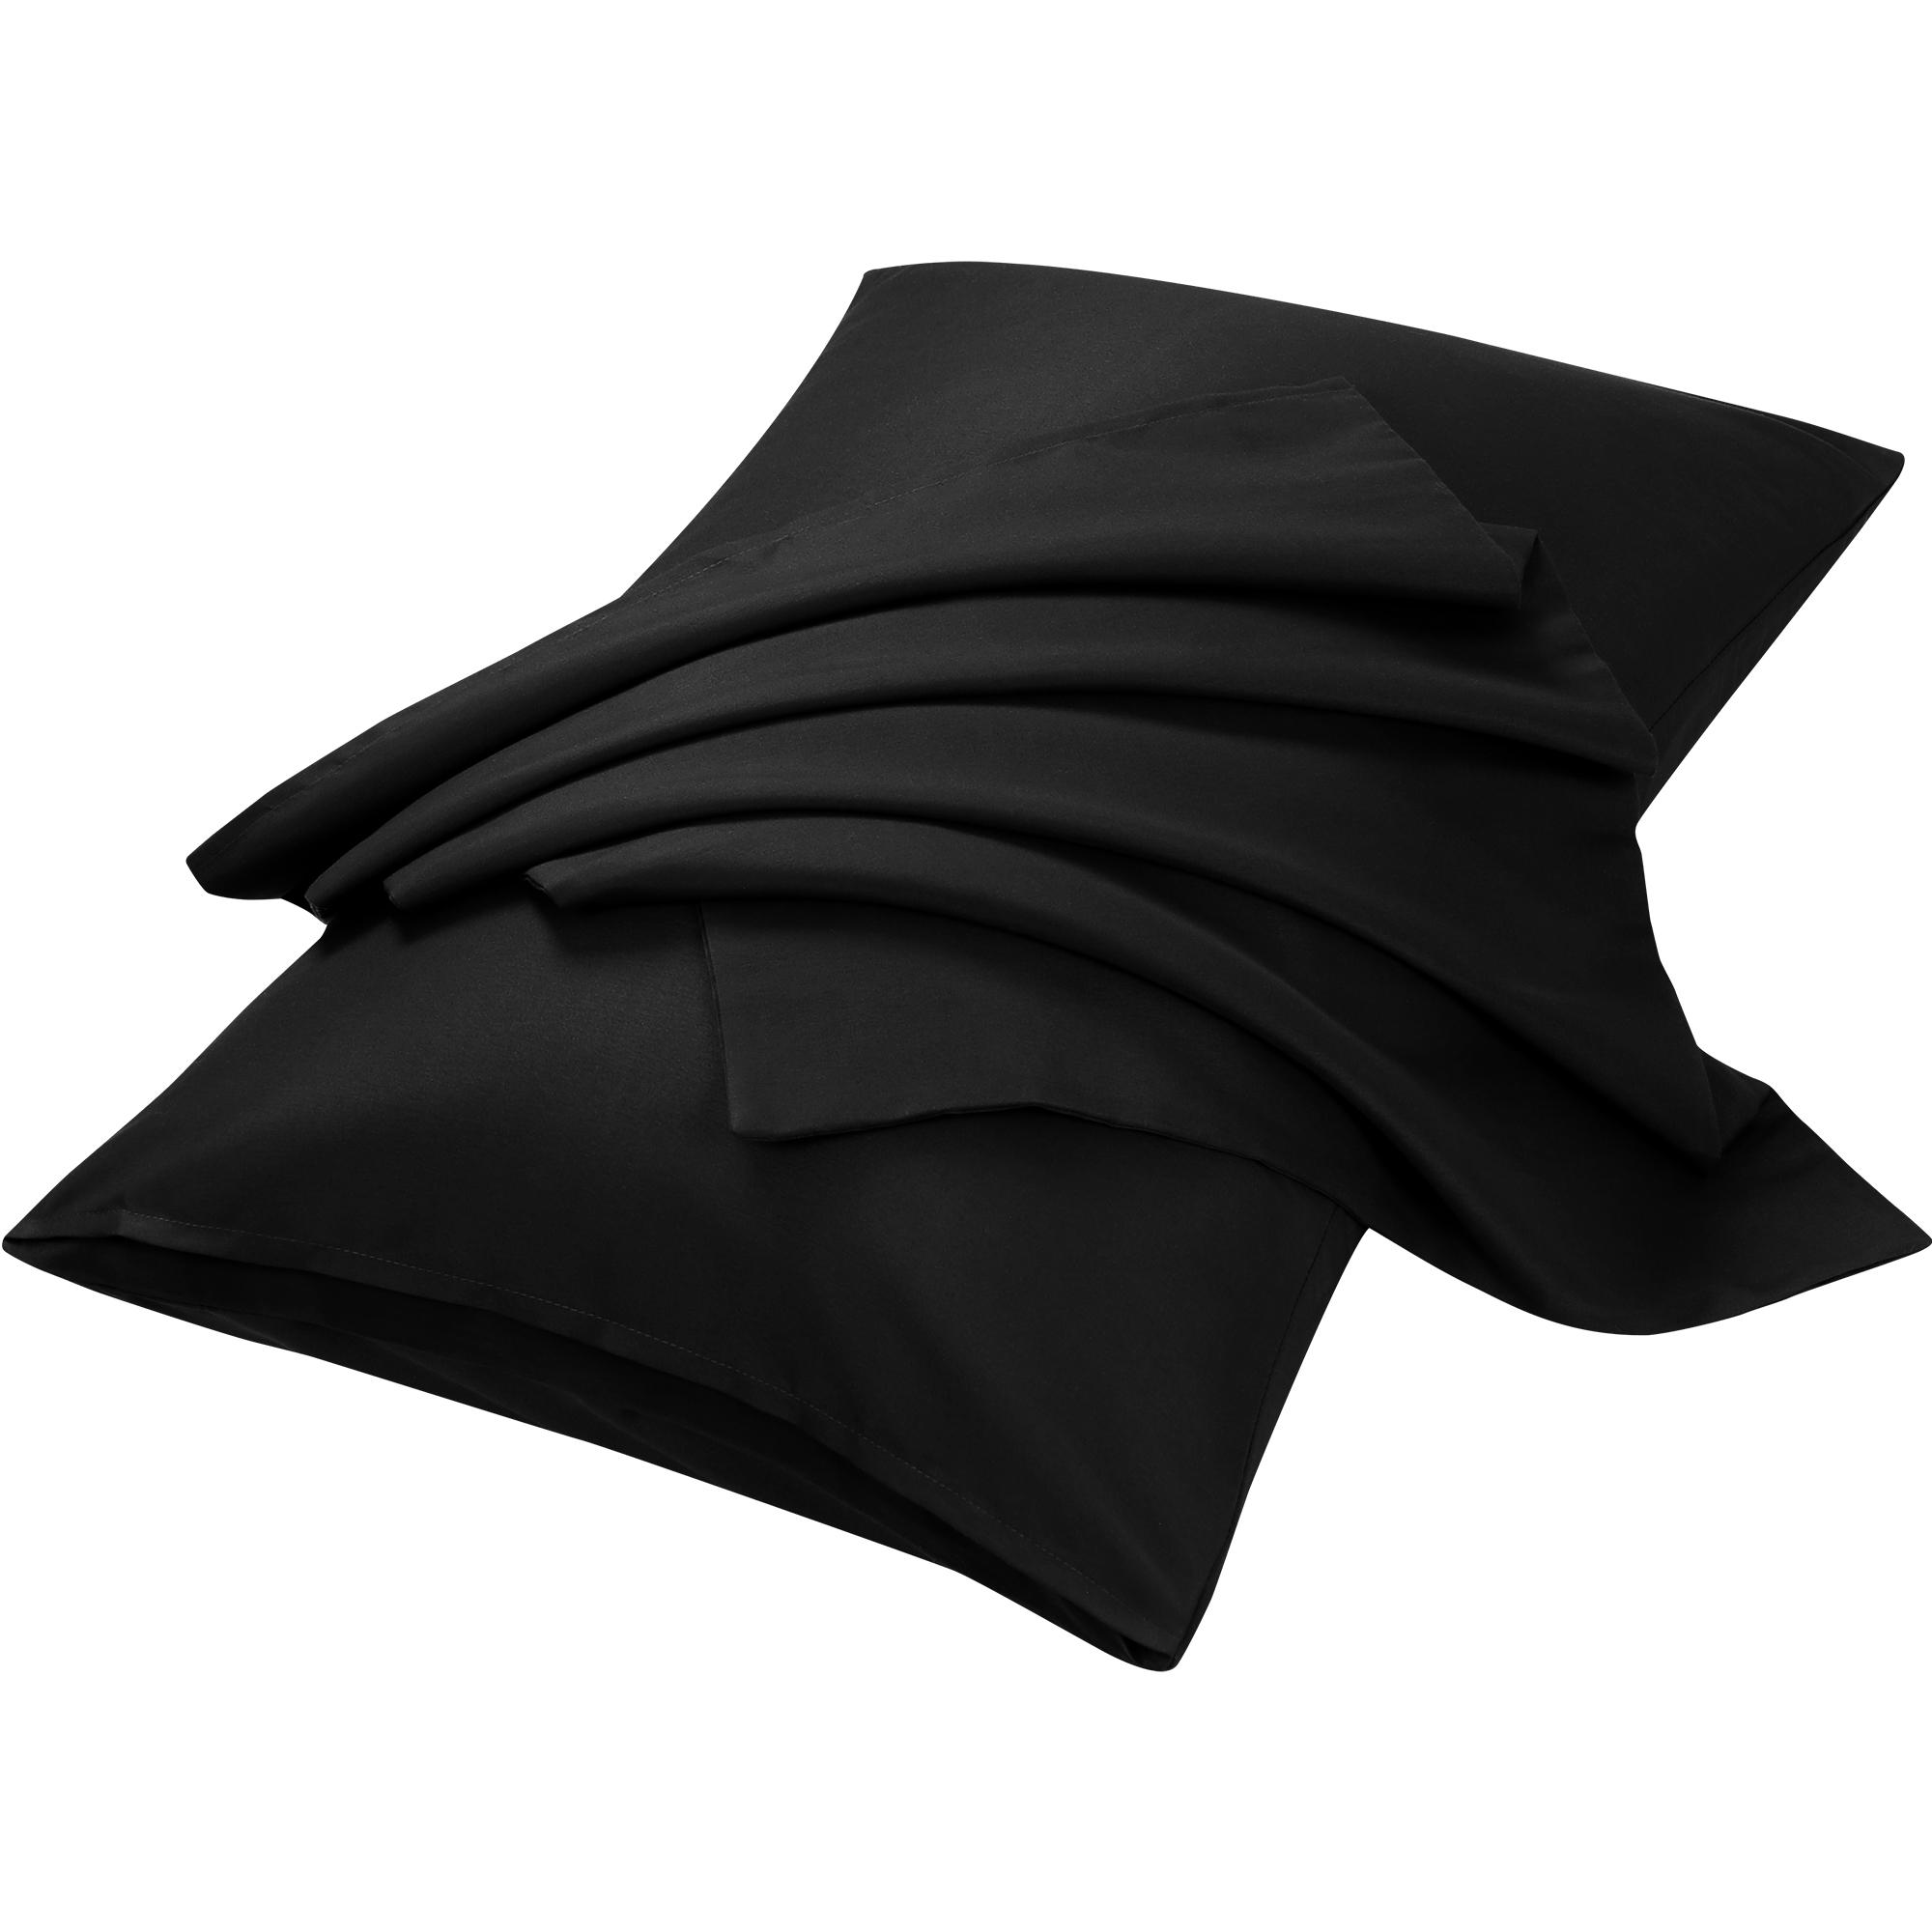 "2pcs Pillowcases Soft Microfiber, No Wrinkle, Black Standard (20"" x 26"")"